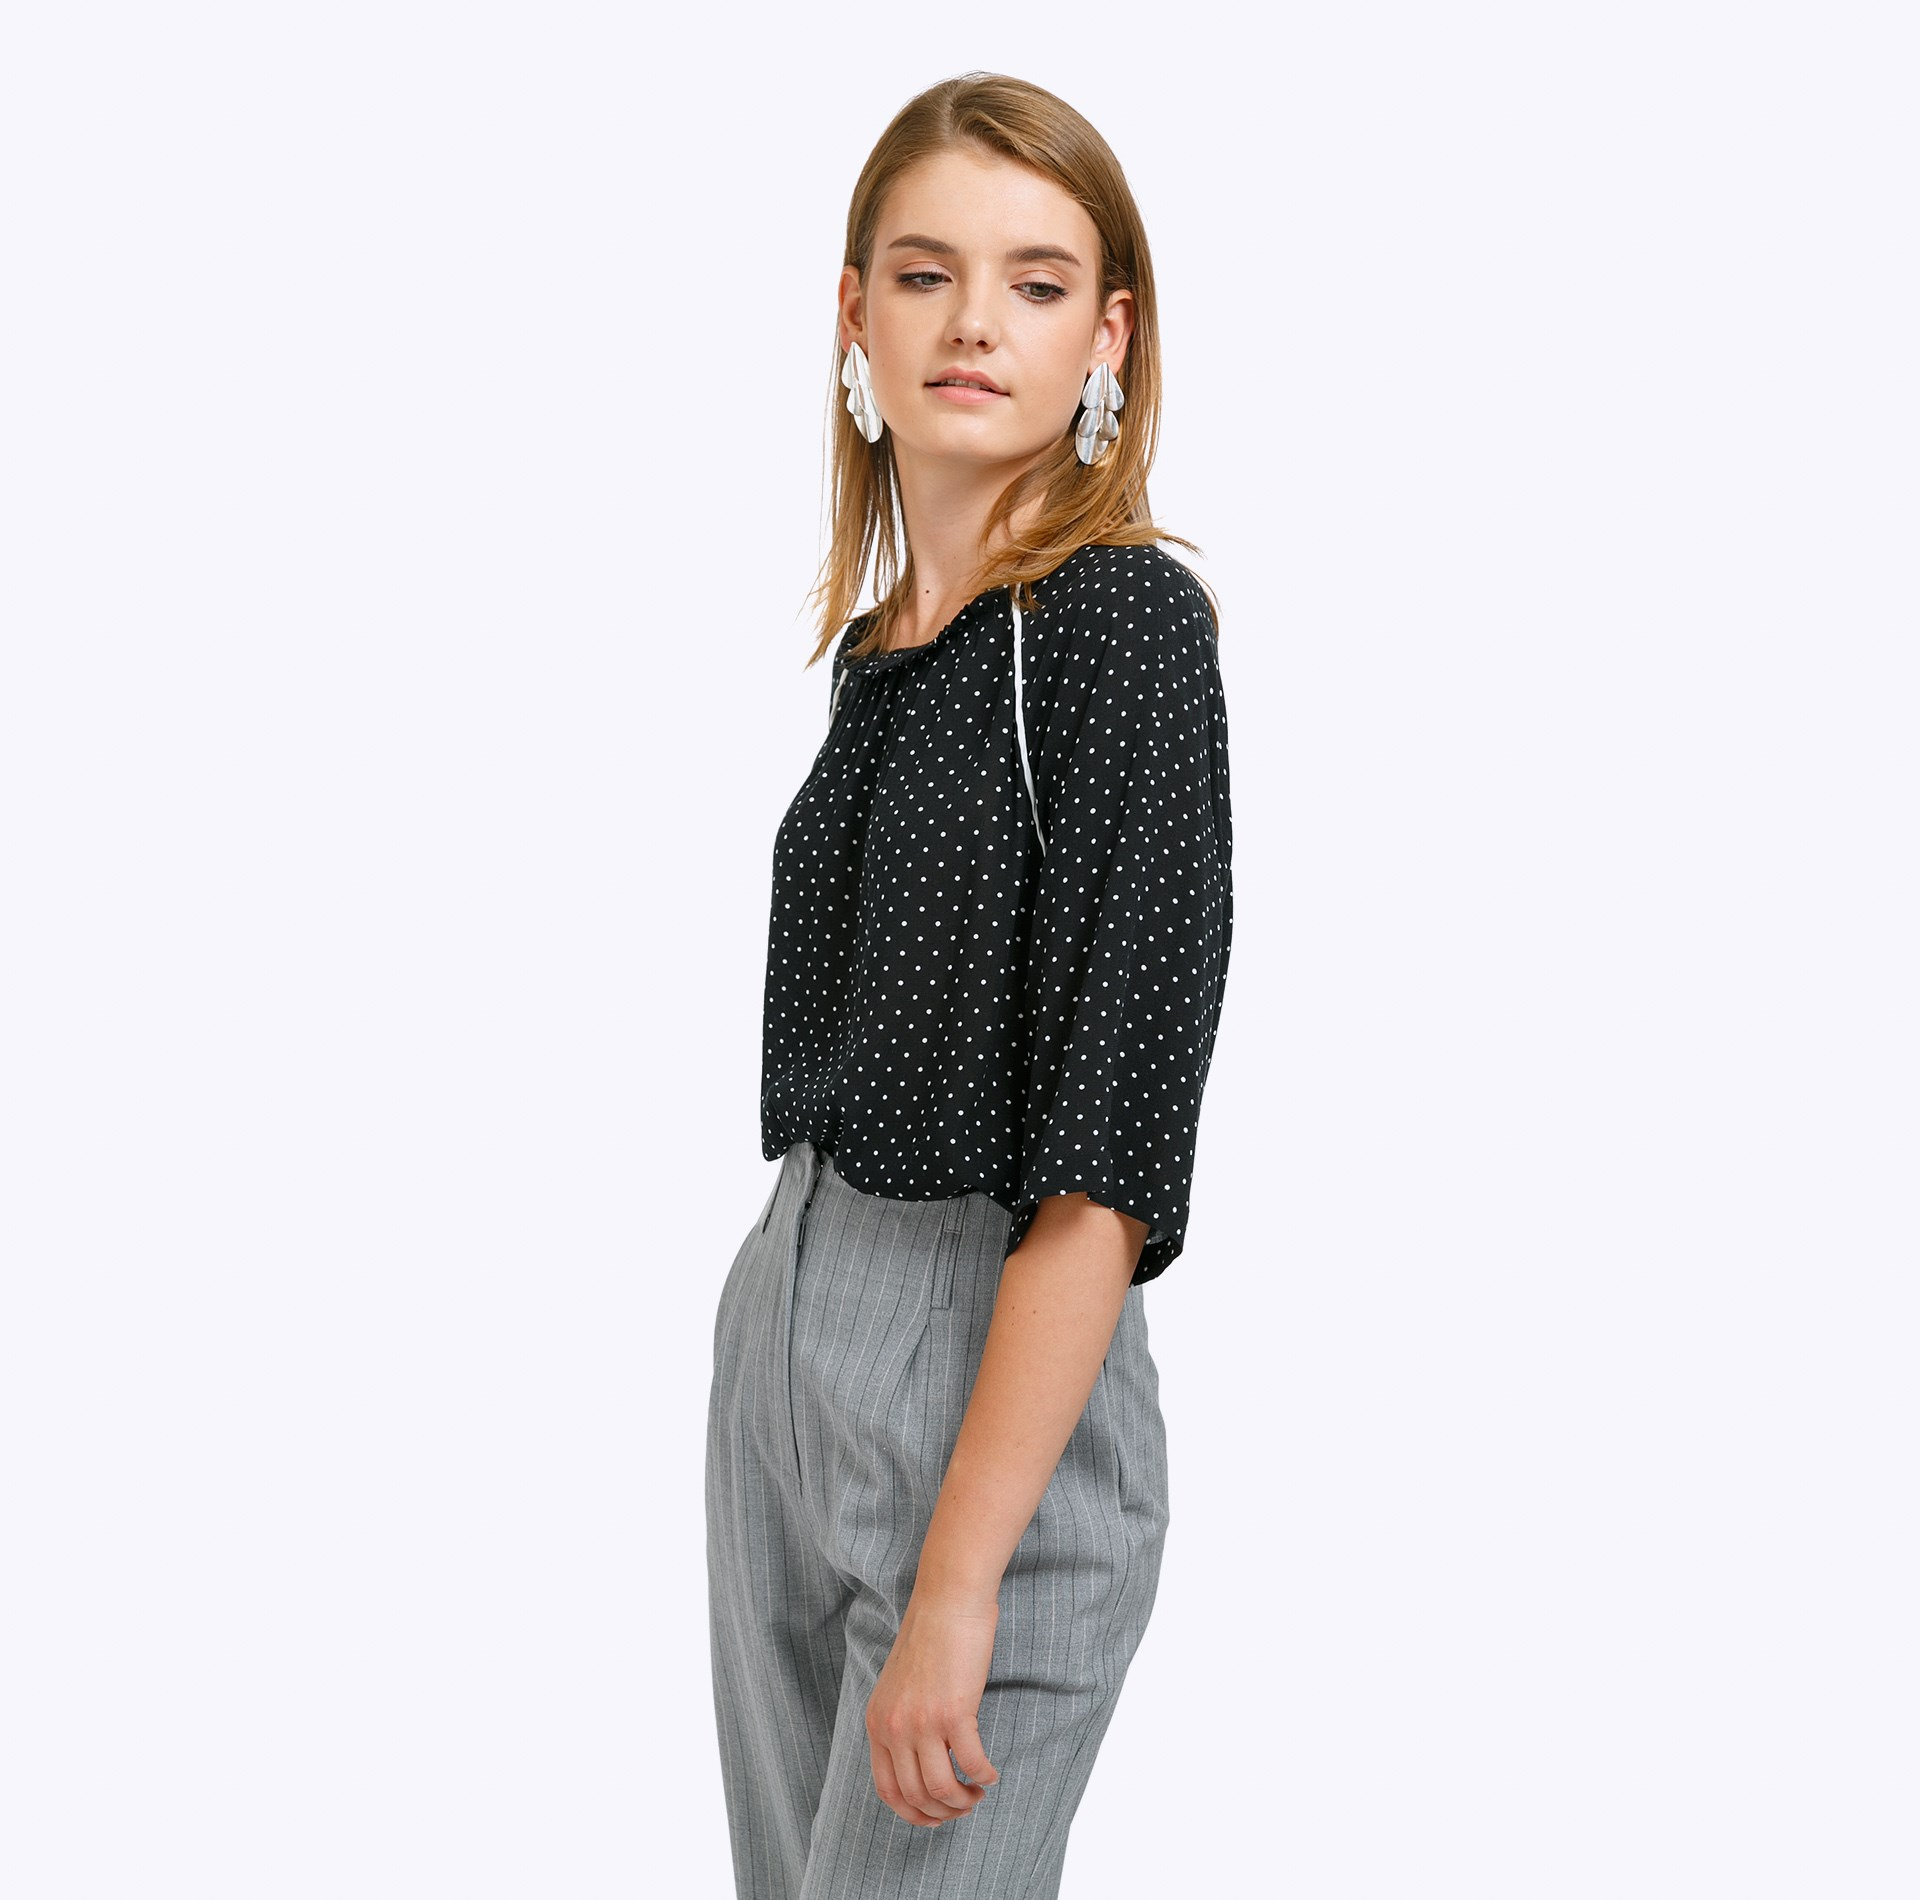 Blouse B2304/cute ruffle trim tie neck chiffon blouse